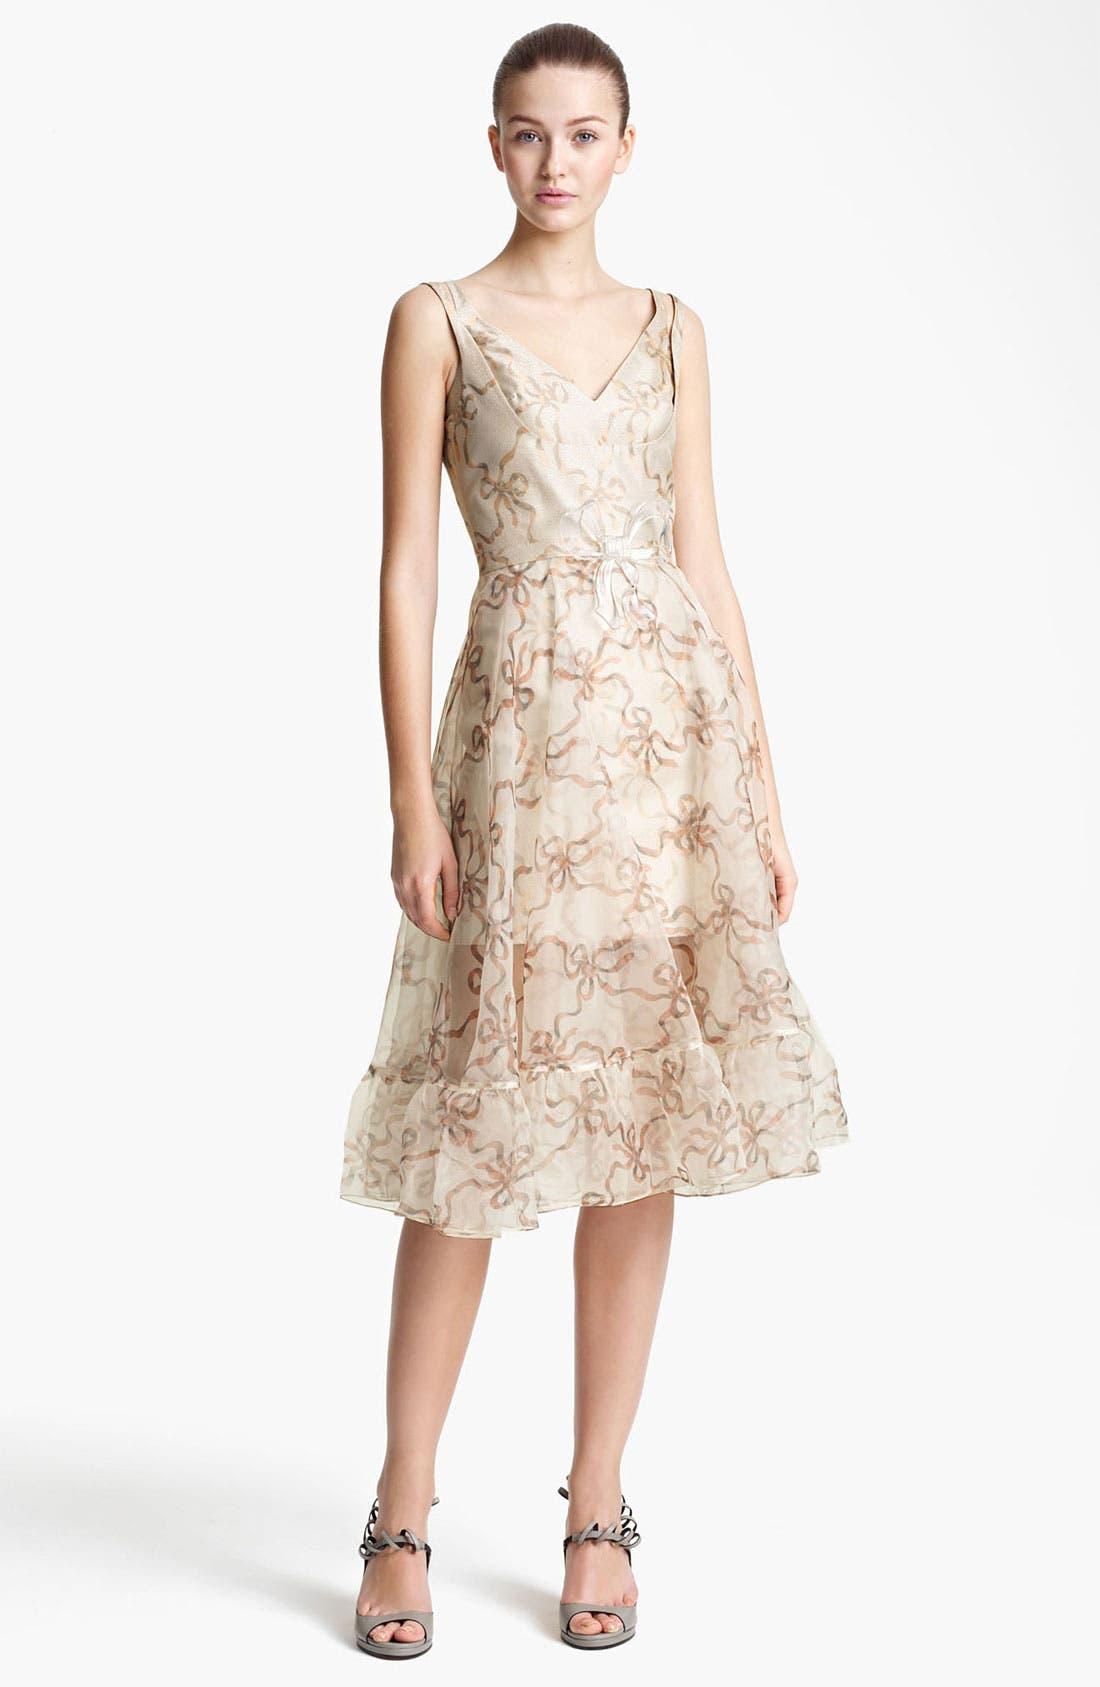 Main Image - Christopher Kane Ribbon Print Organza Dress